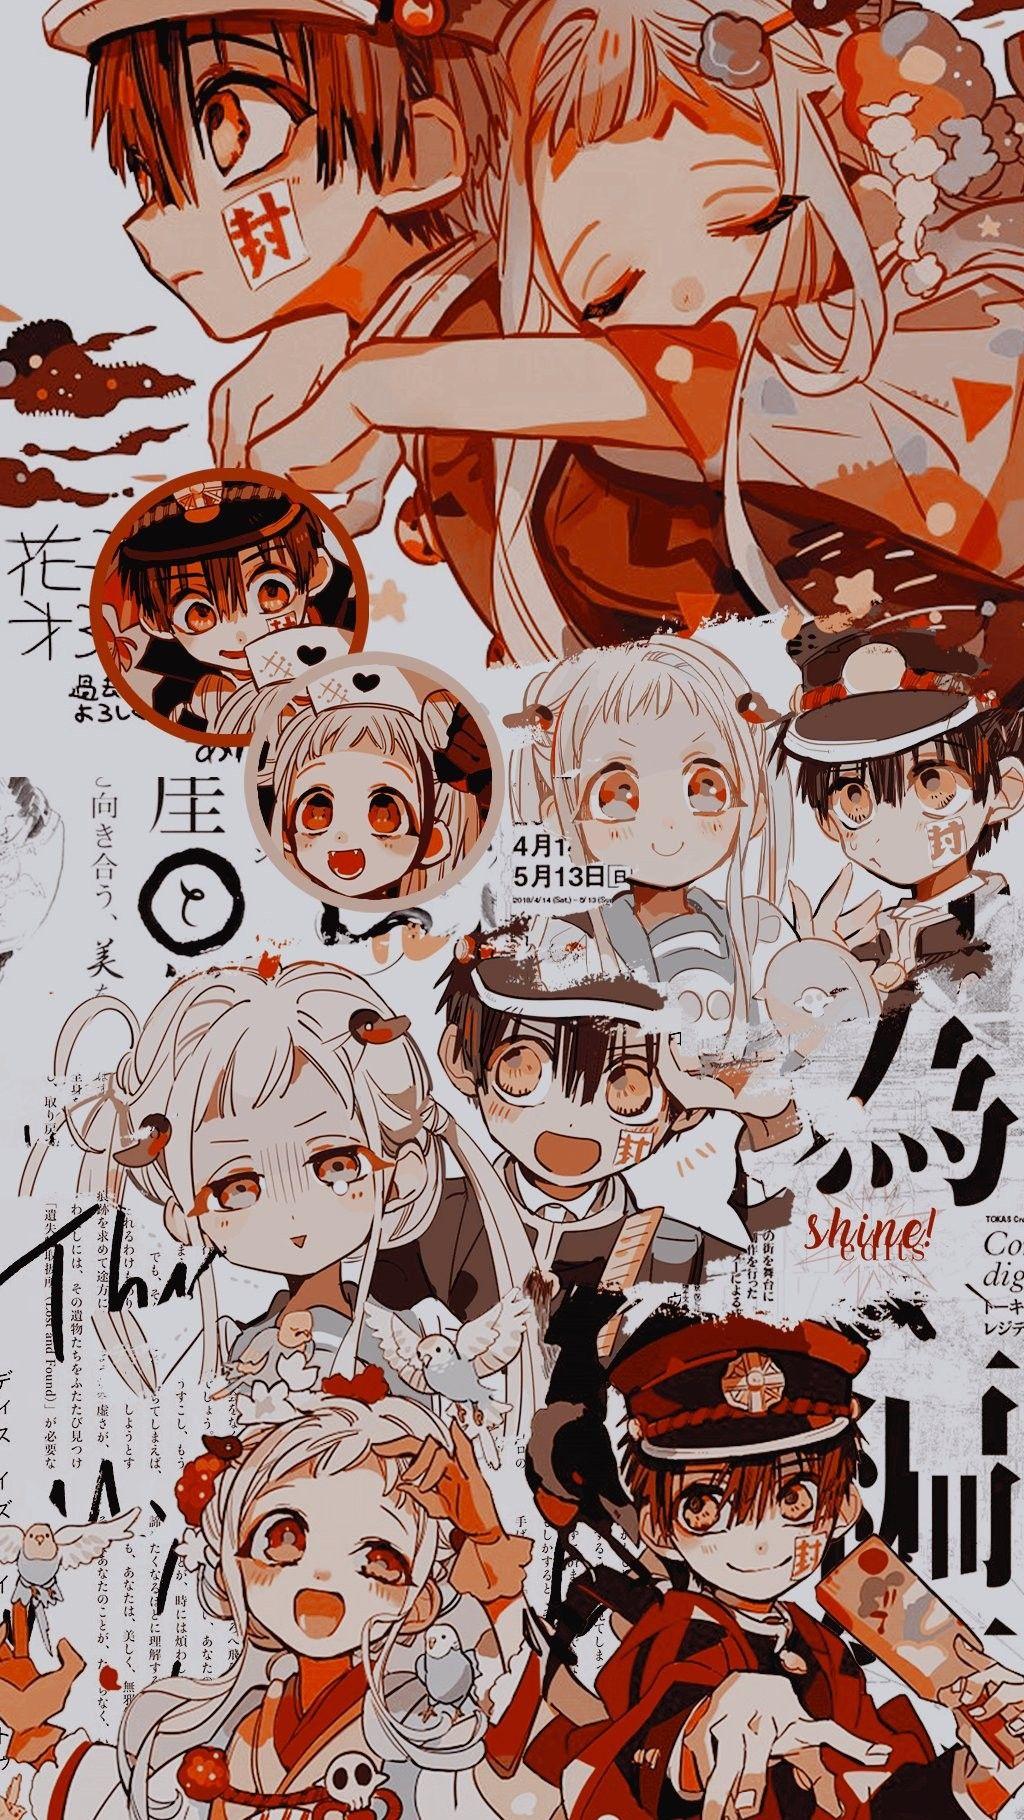 Hanako X Yashiro Anime Wallpaper Cute Anime Wallpaper Cool Anime Wallpapers 13 x anime wallpaper